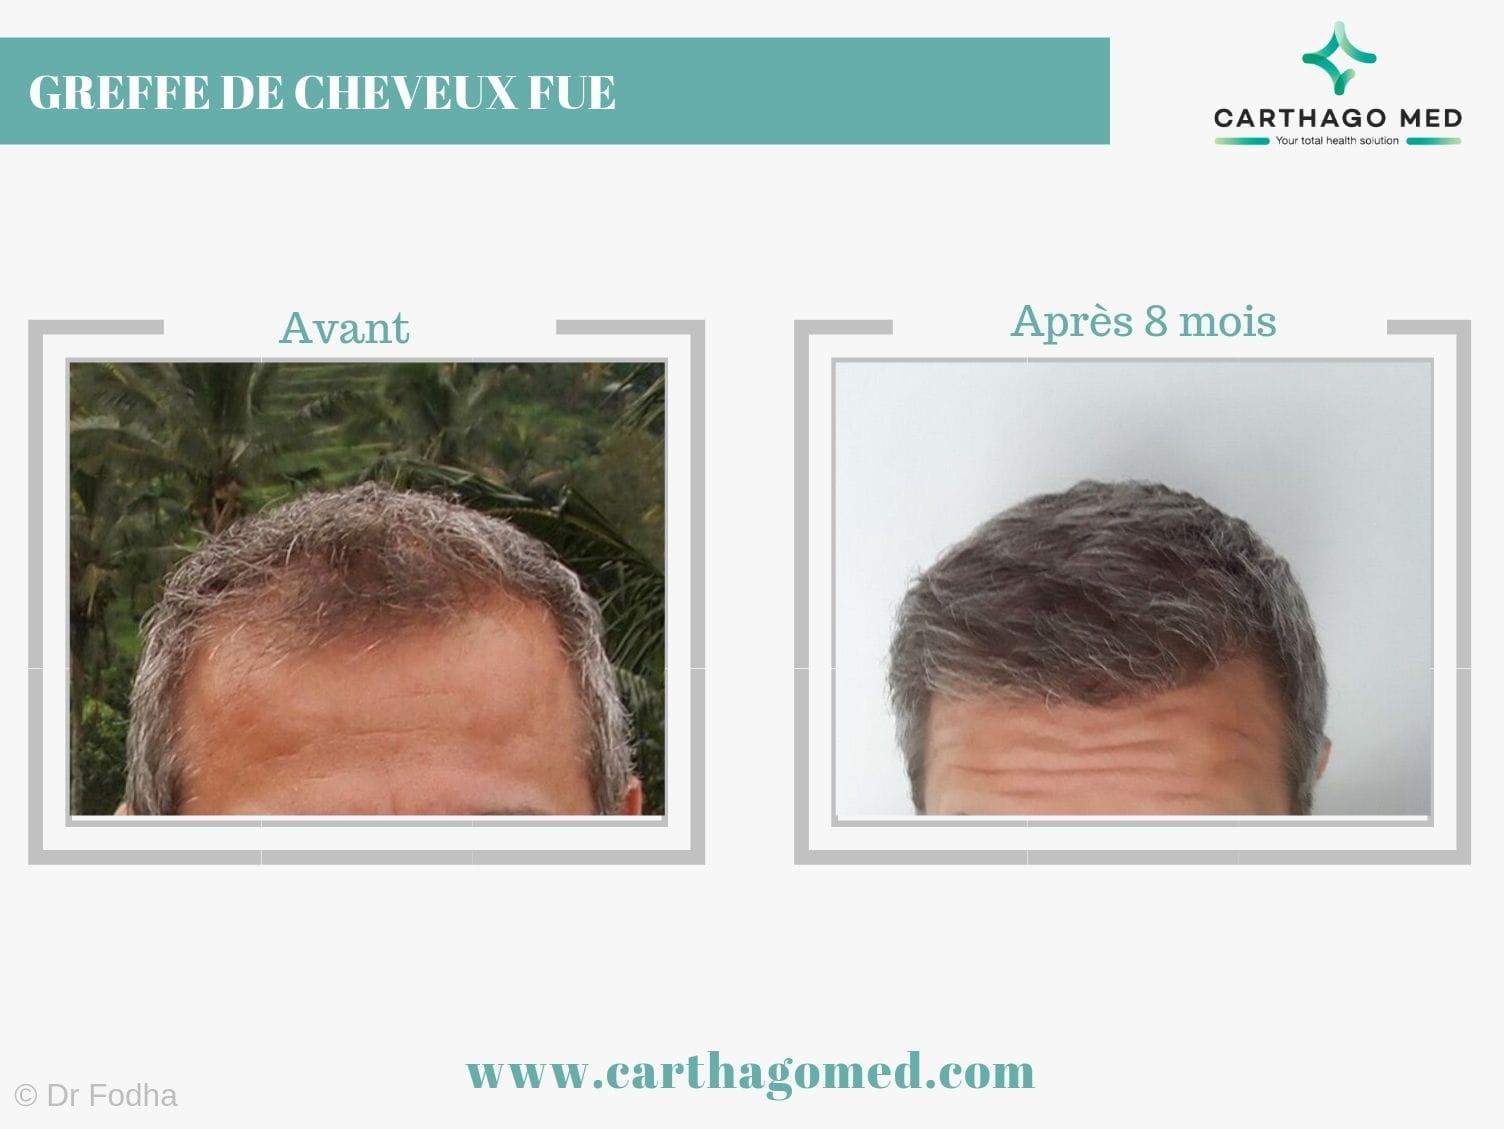 Greffe de cheveux carthago med (1)